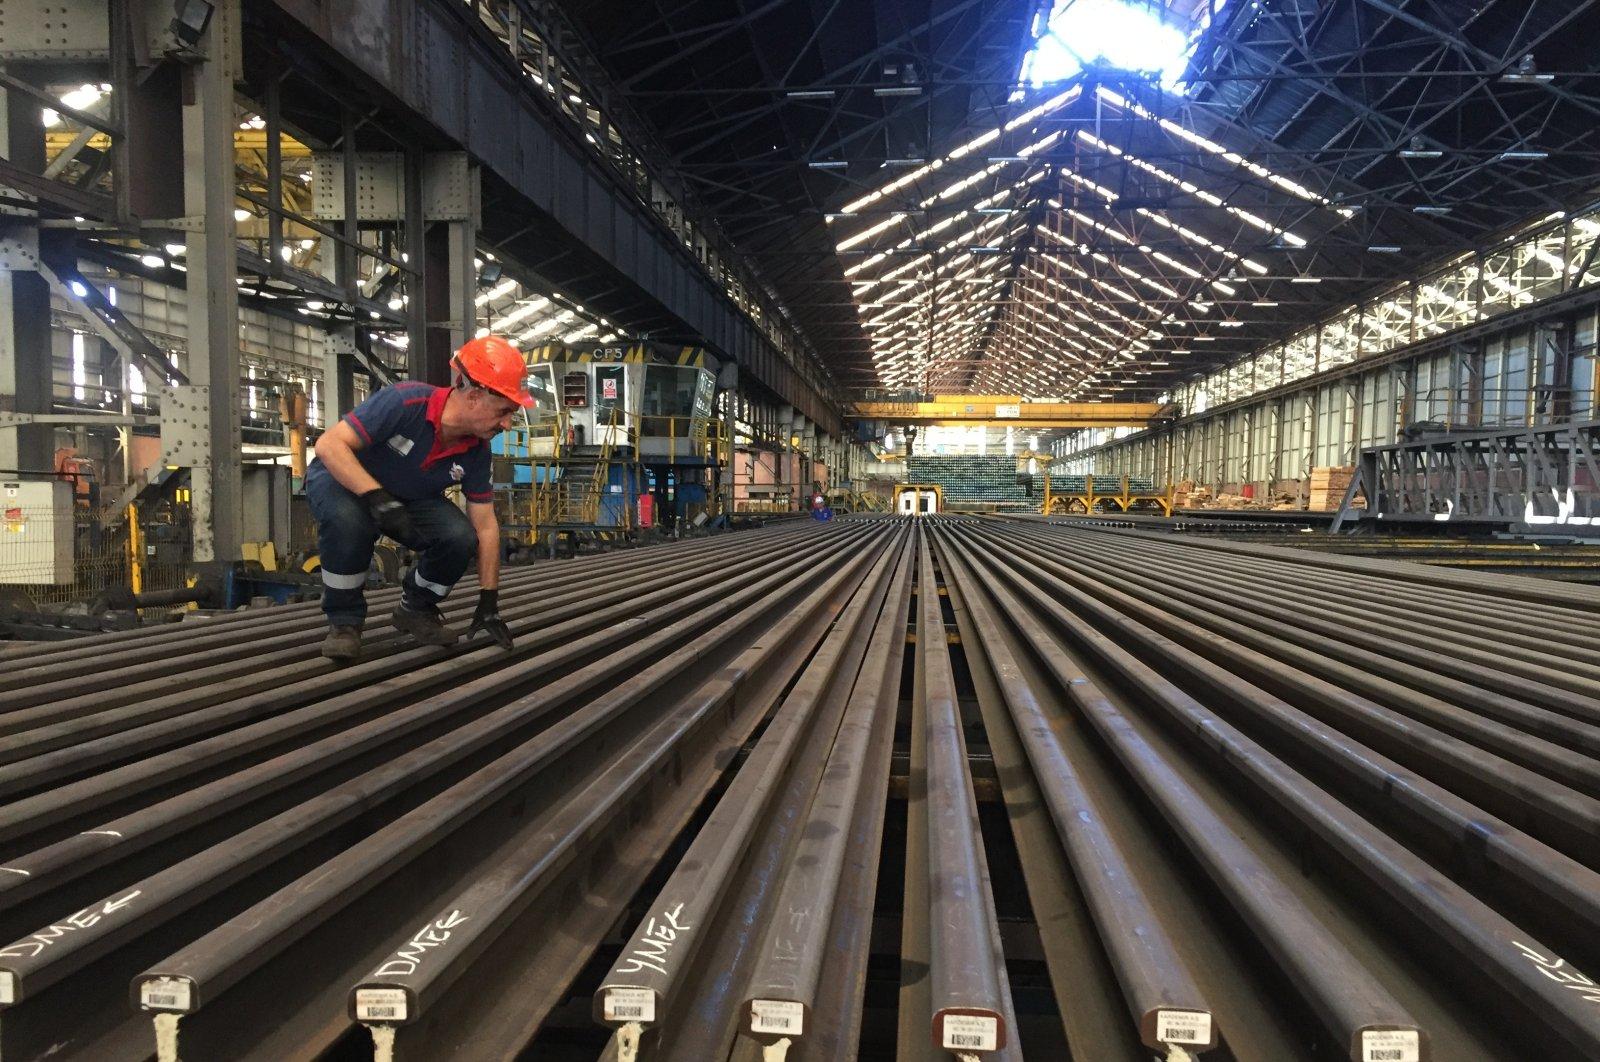 A worker at an iron and steel factory in Kardemir, Karabük, northern Turkey, Oct. 21, 2020. (IHA Photo)